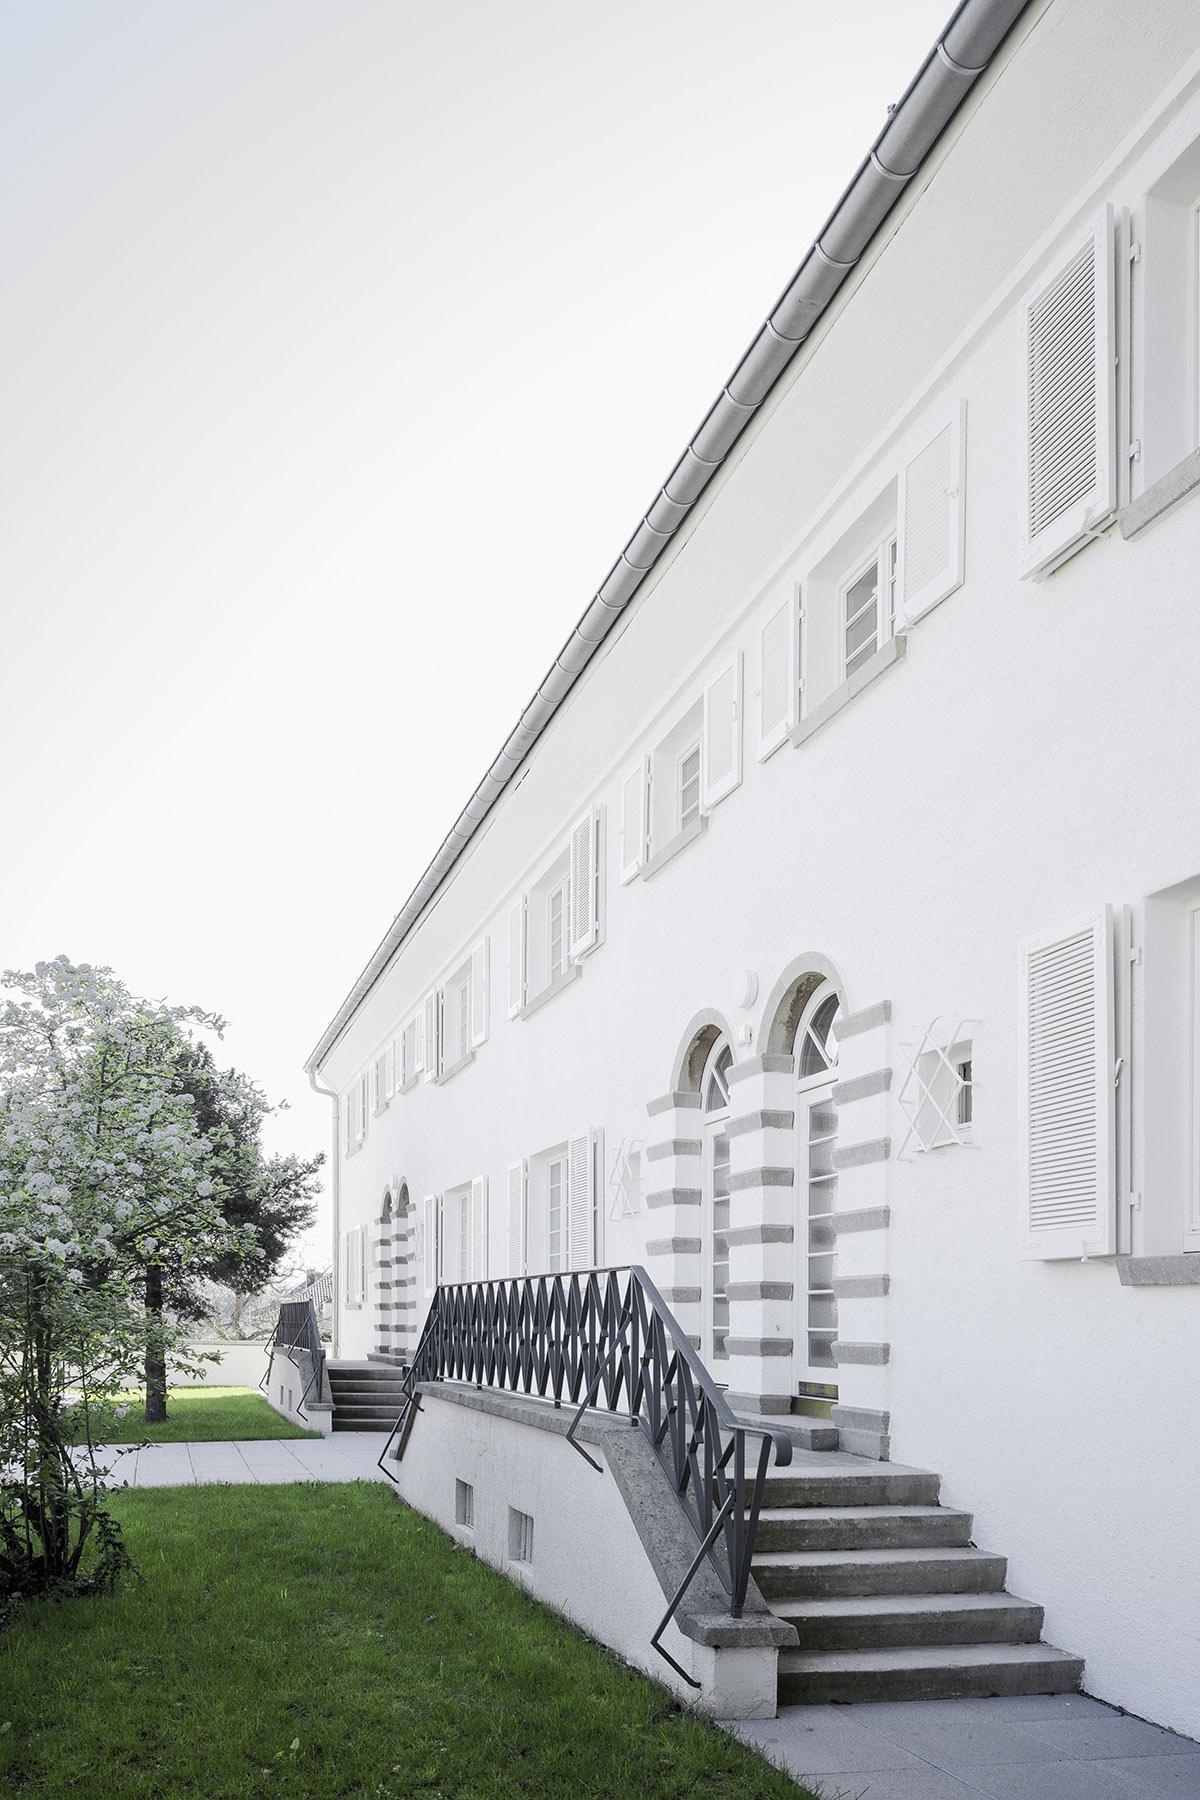 kaestle&ocker - Staatsministerium Sandbergerstraße